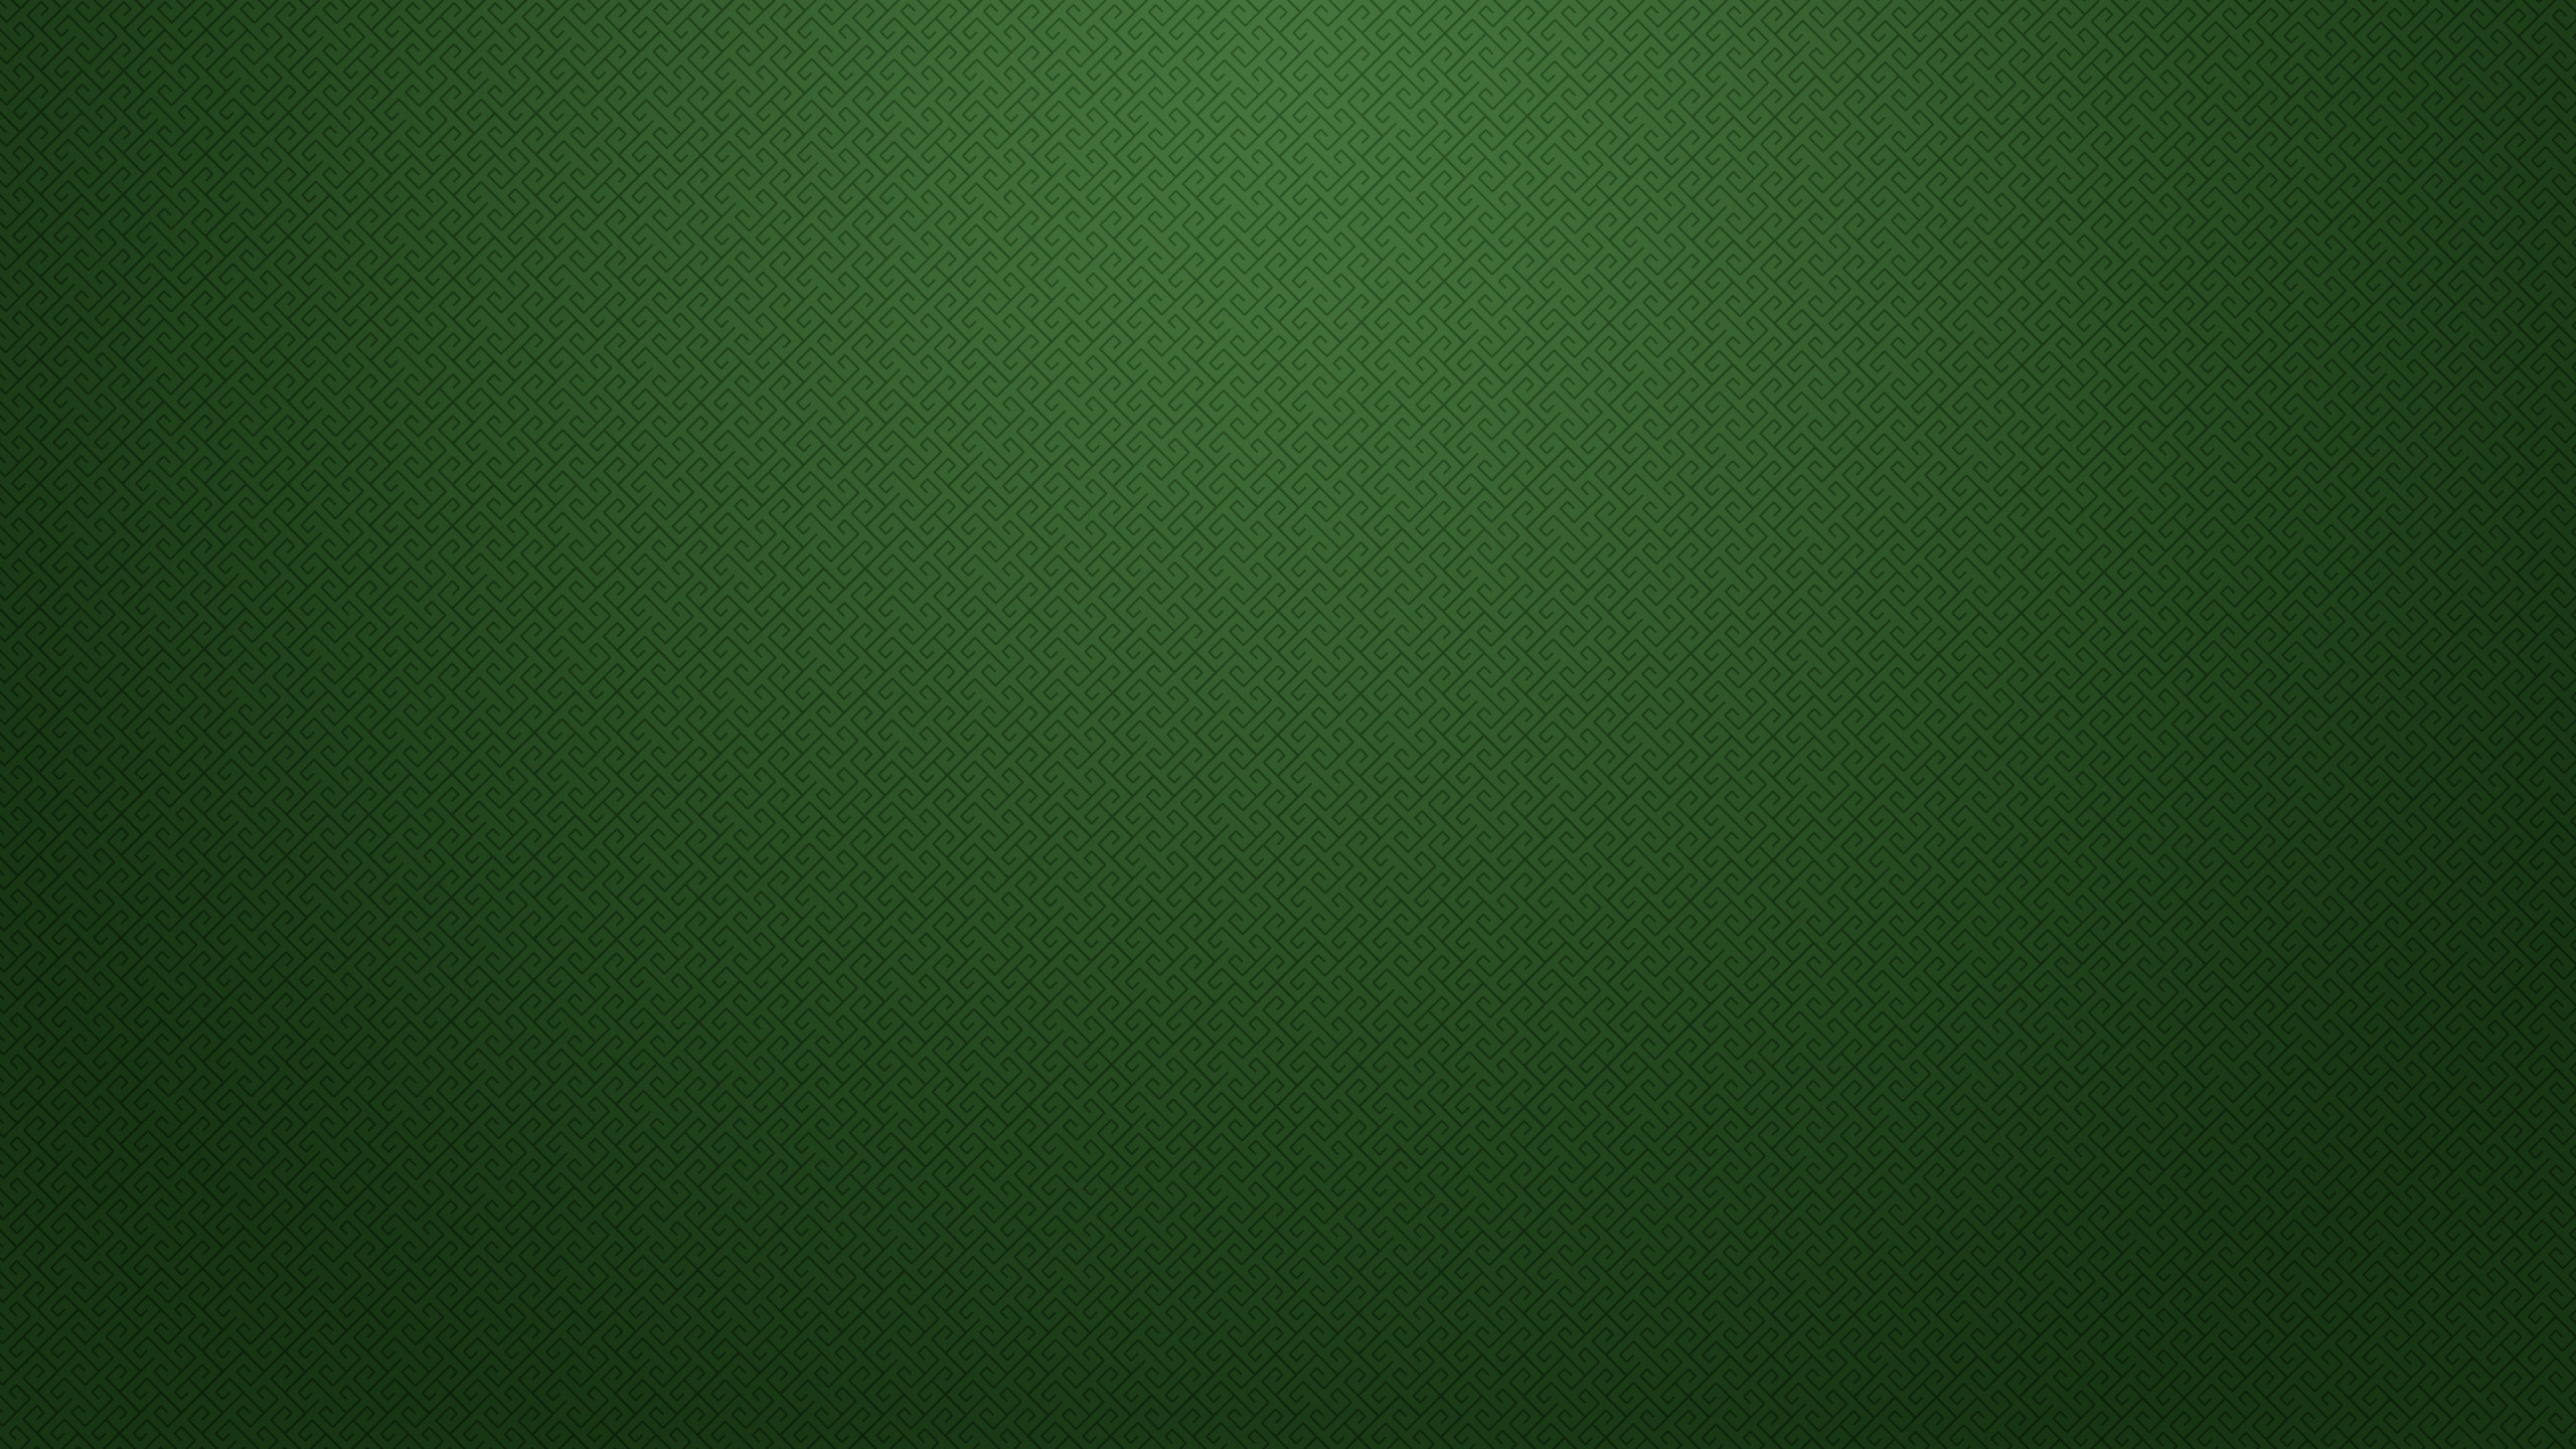 Solid Color Patterns Spiral Wallpaper Background 4K Ultra HD 3840x2160